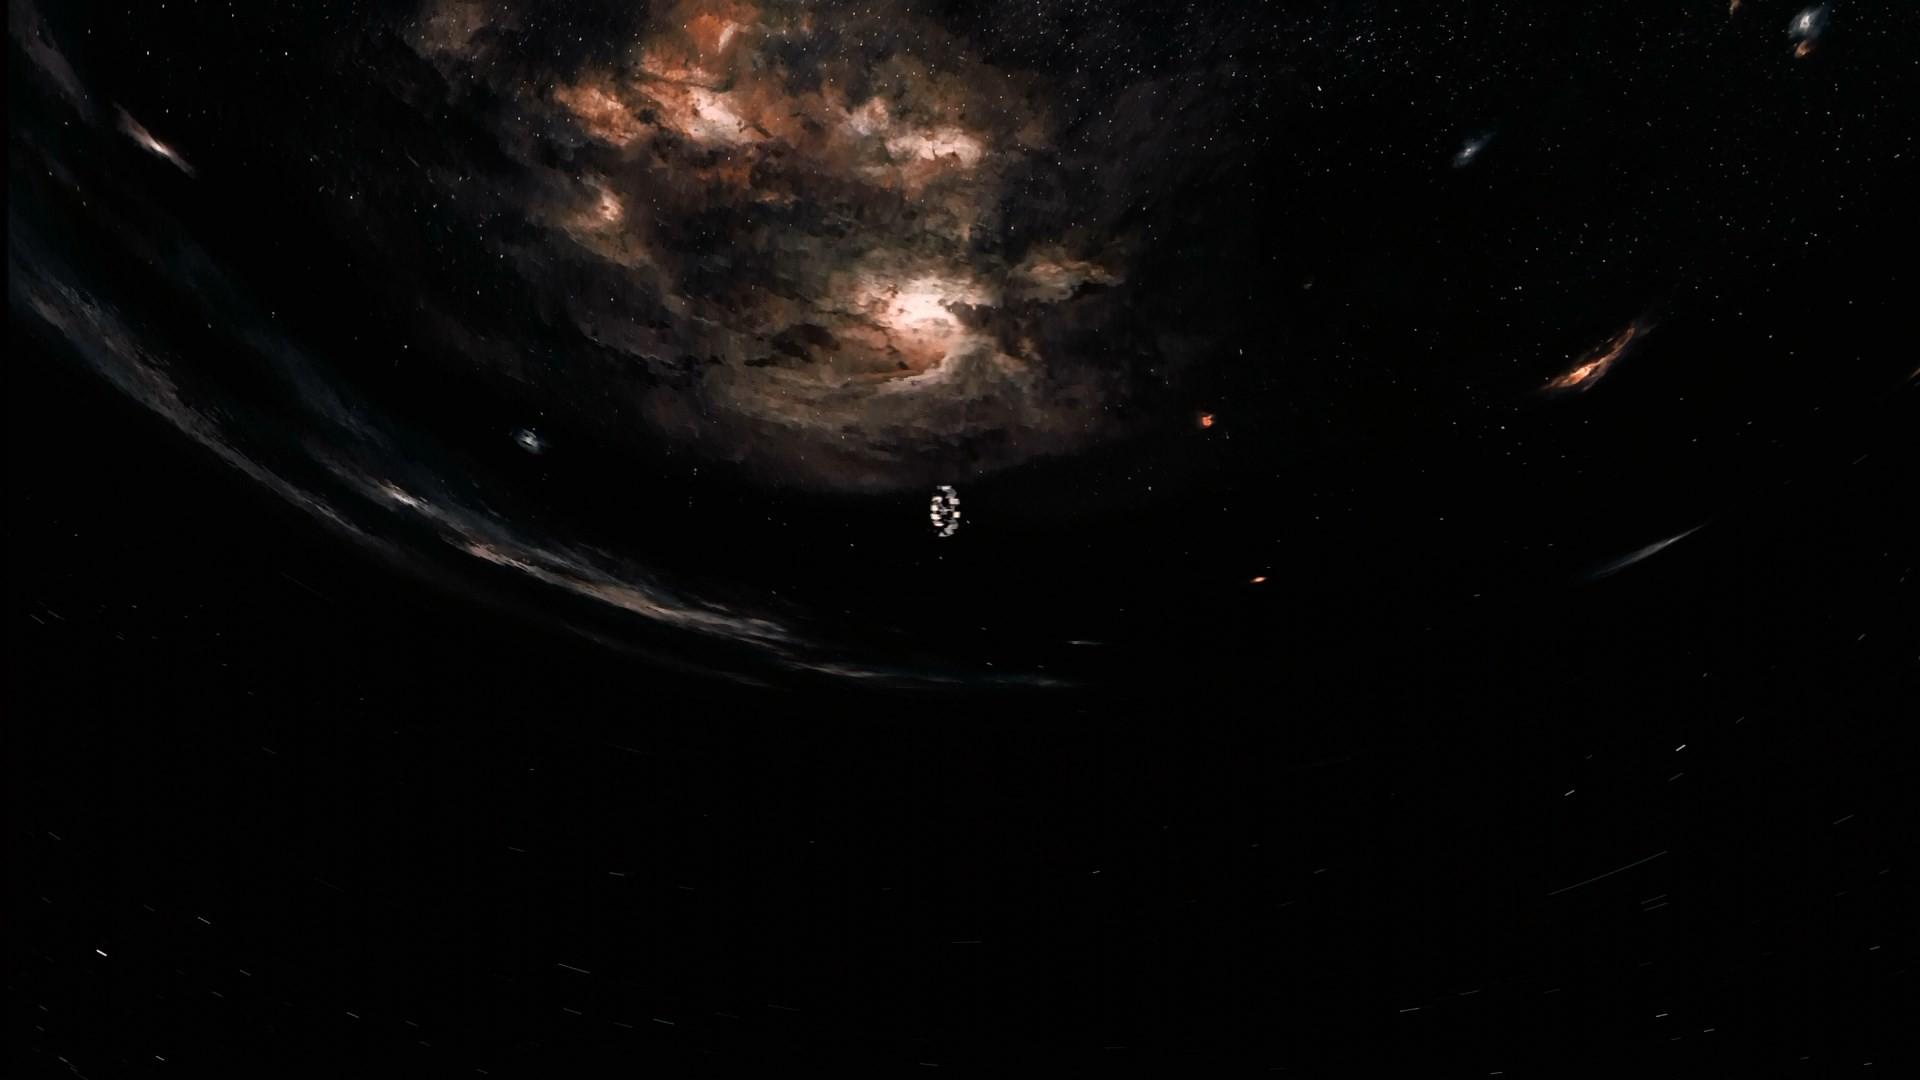 Interstellar wallpaper 1920x1080